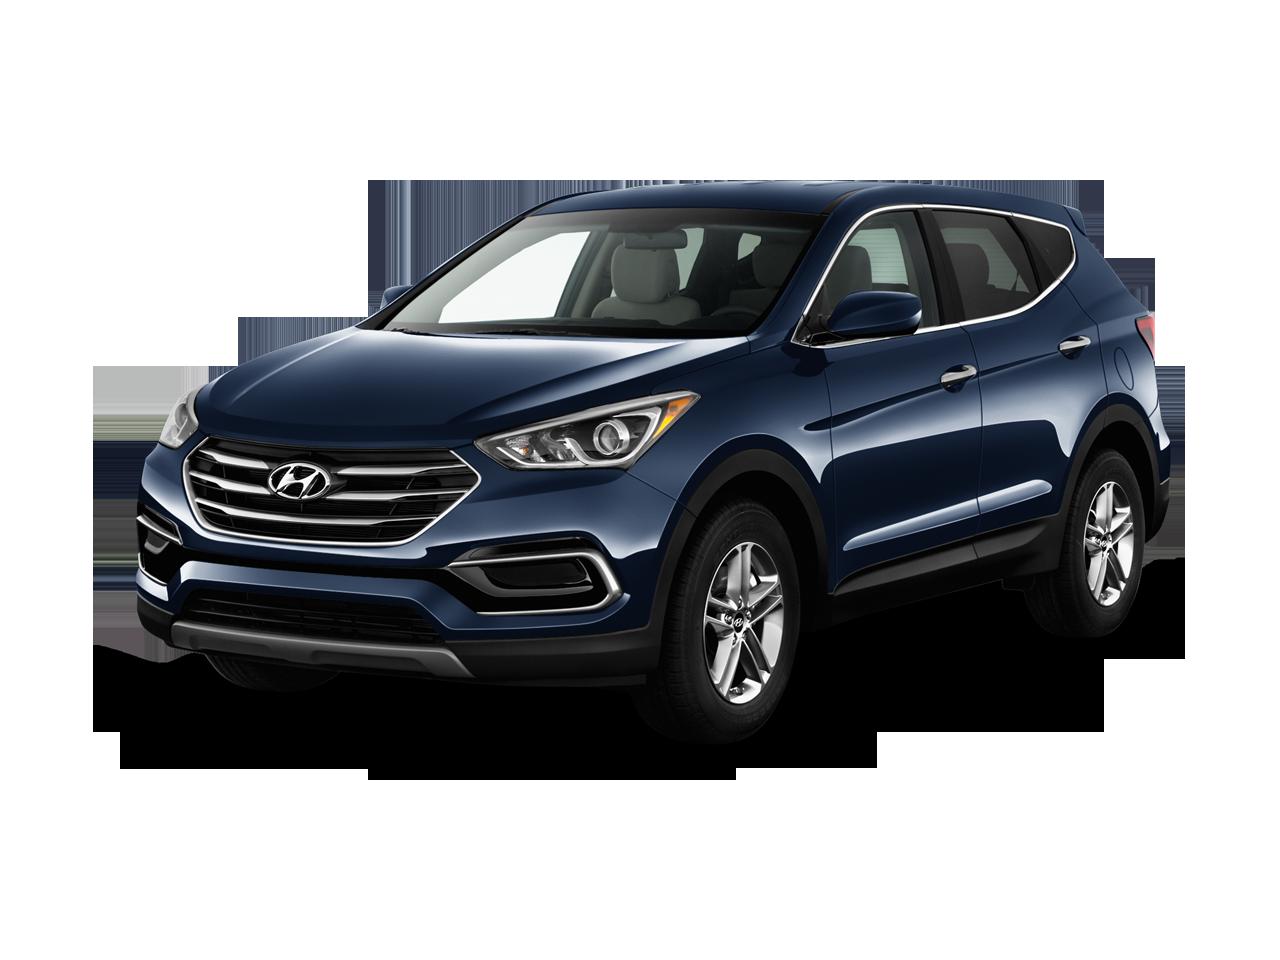 New 2017 Hyundai Santa Fe Sport 2 0l Turbo Near Dearborn